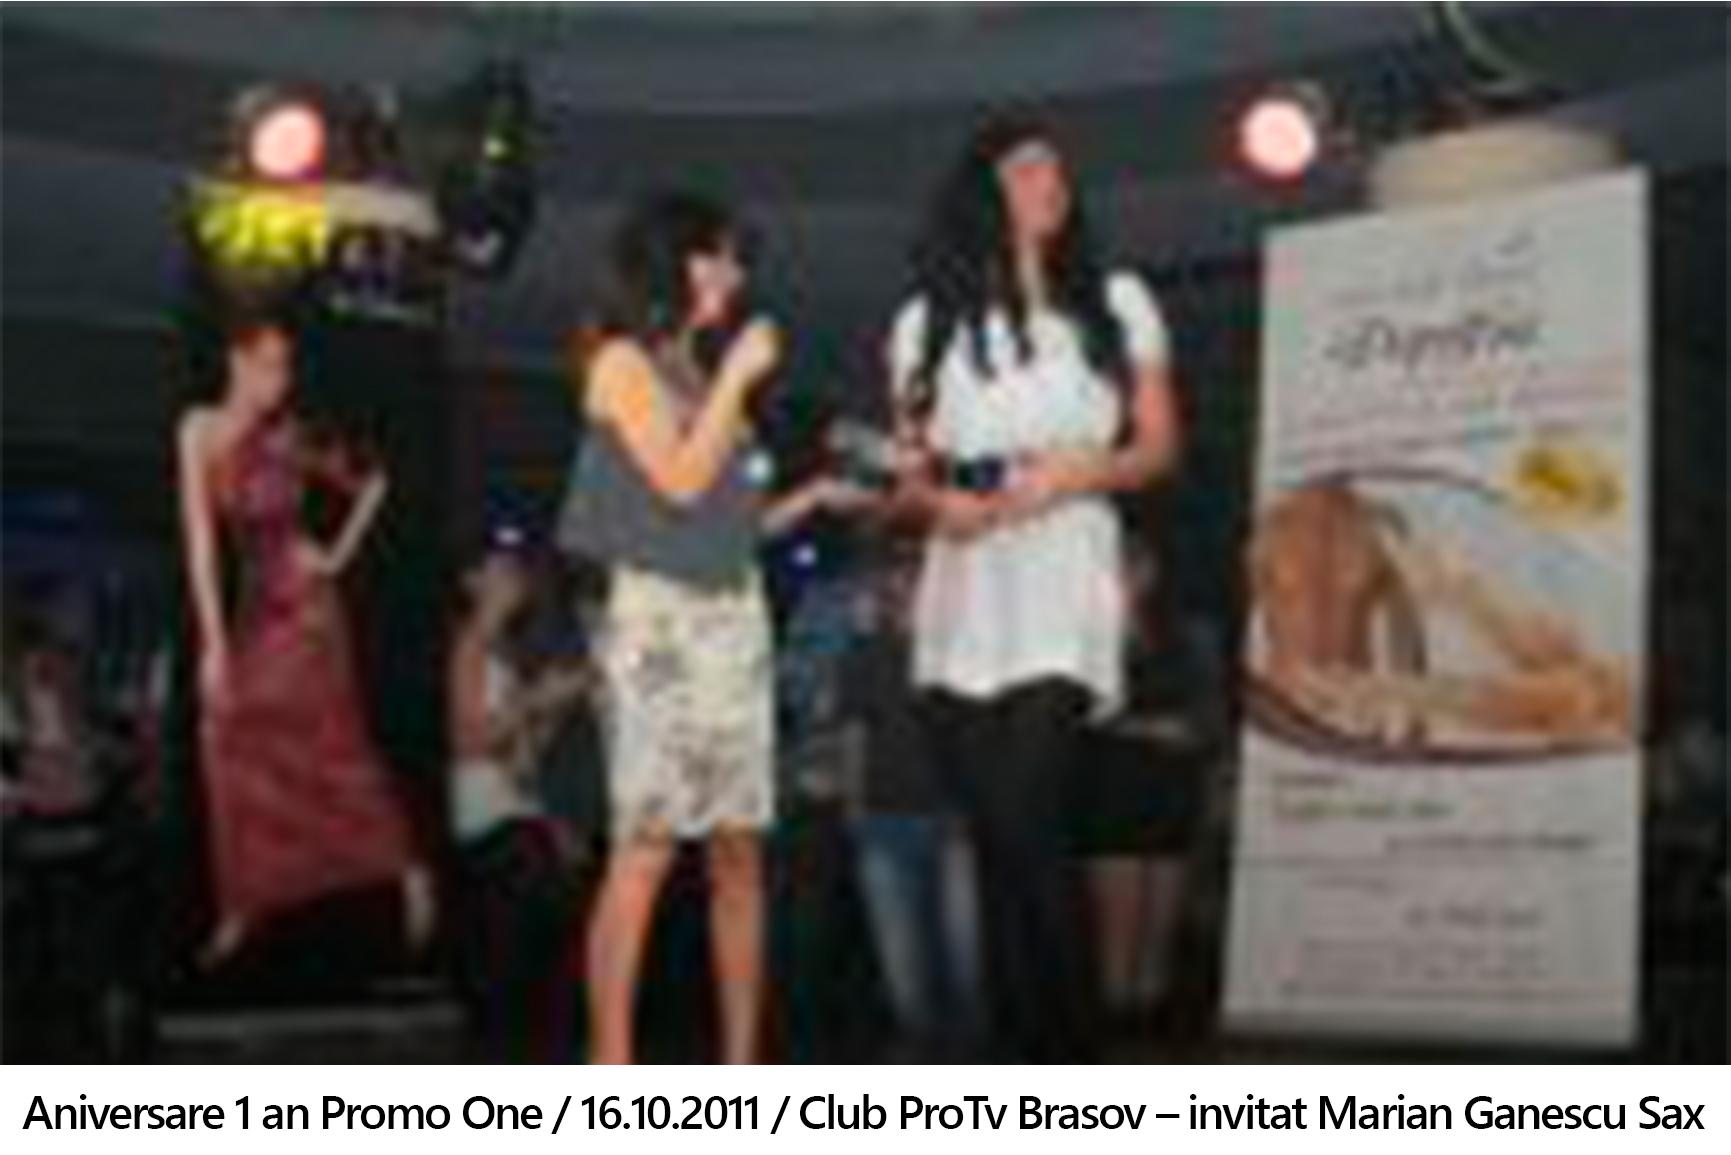 Galerie foto – Aniversare 1 an Promo One 16.10.2011 Club ProTv Brasov – invitat Marian Ganescu Sax